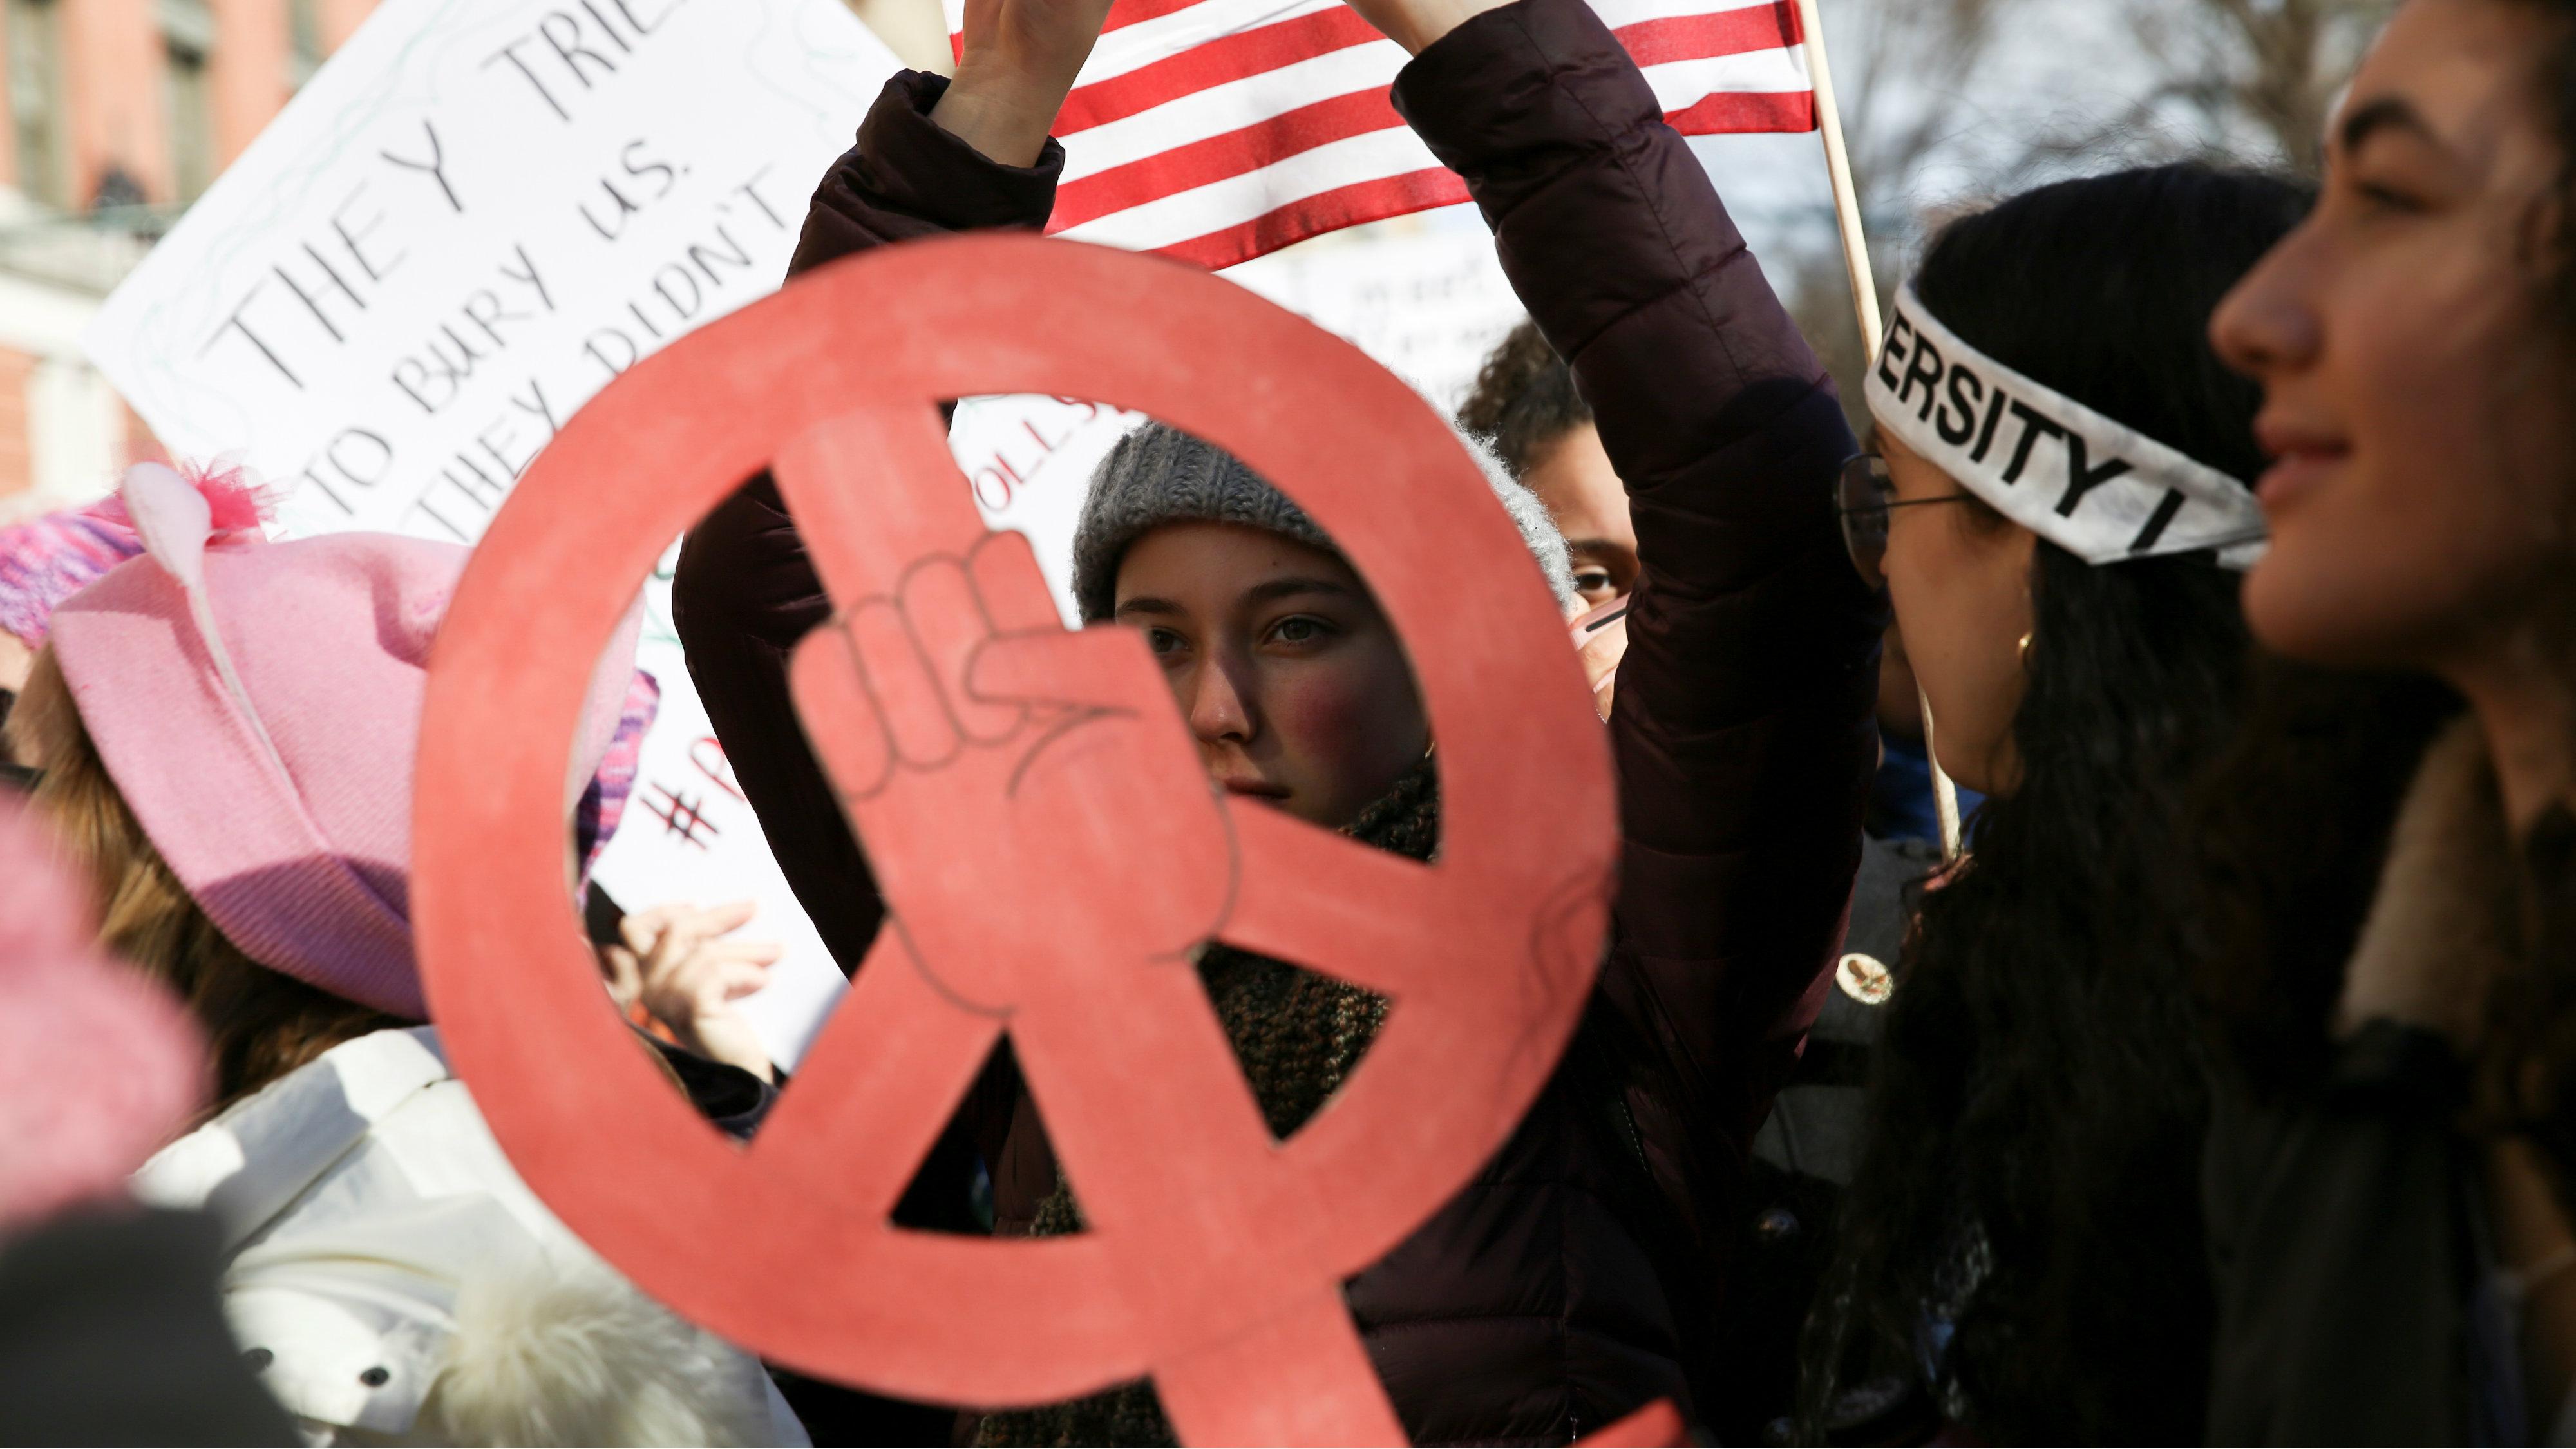 Demonstrators take part in the Women's March in Manhattan in New York